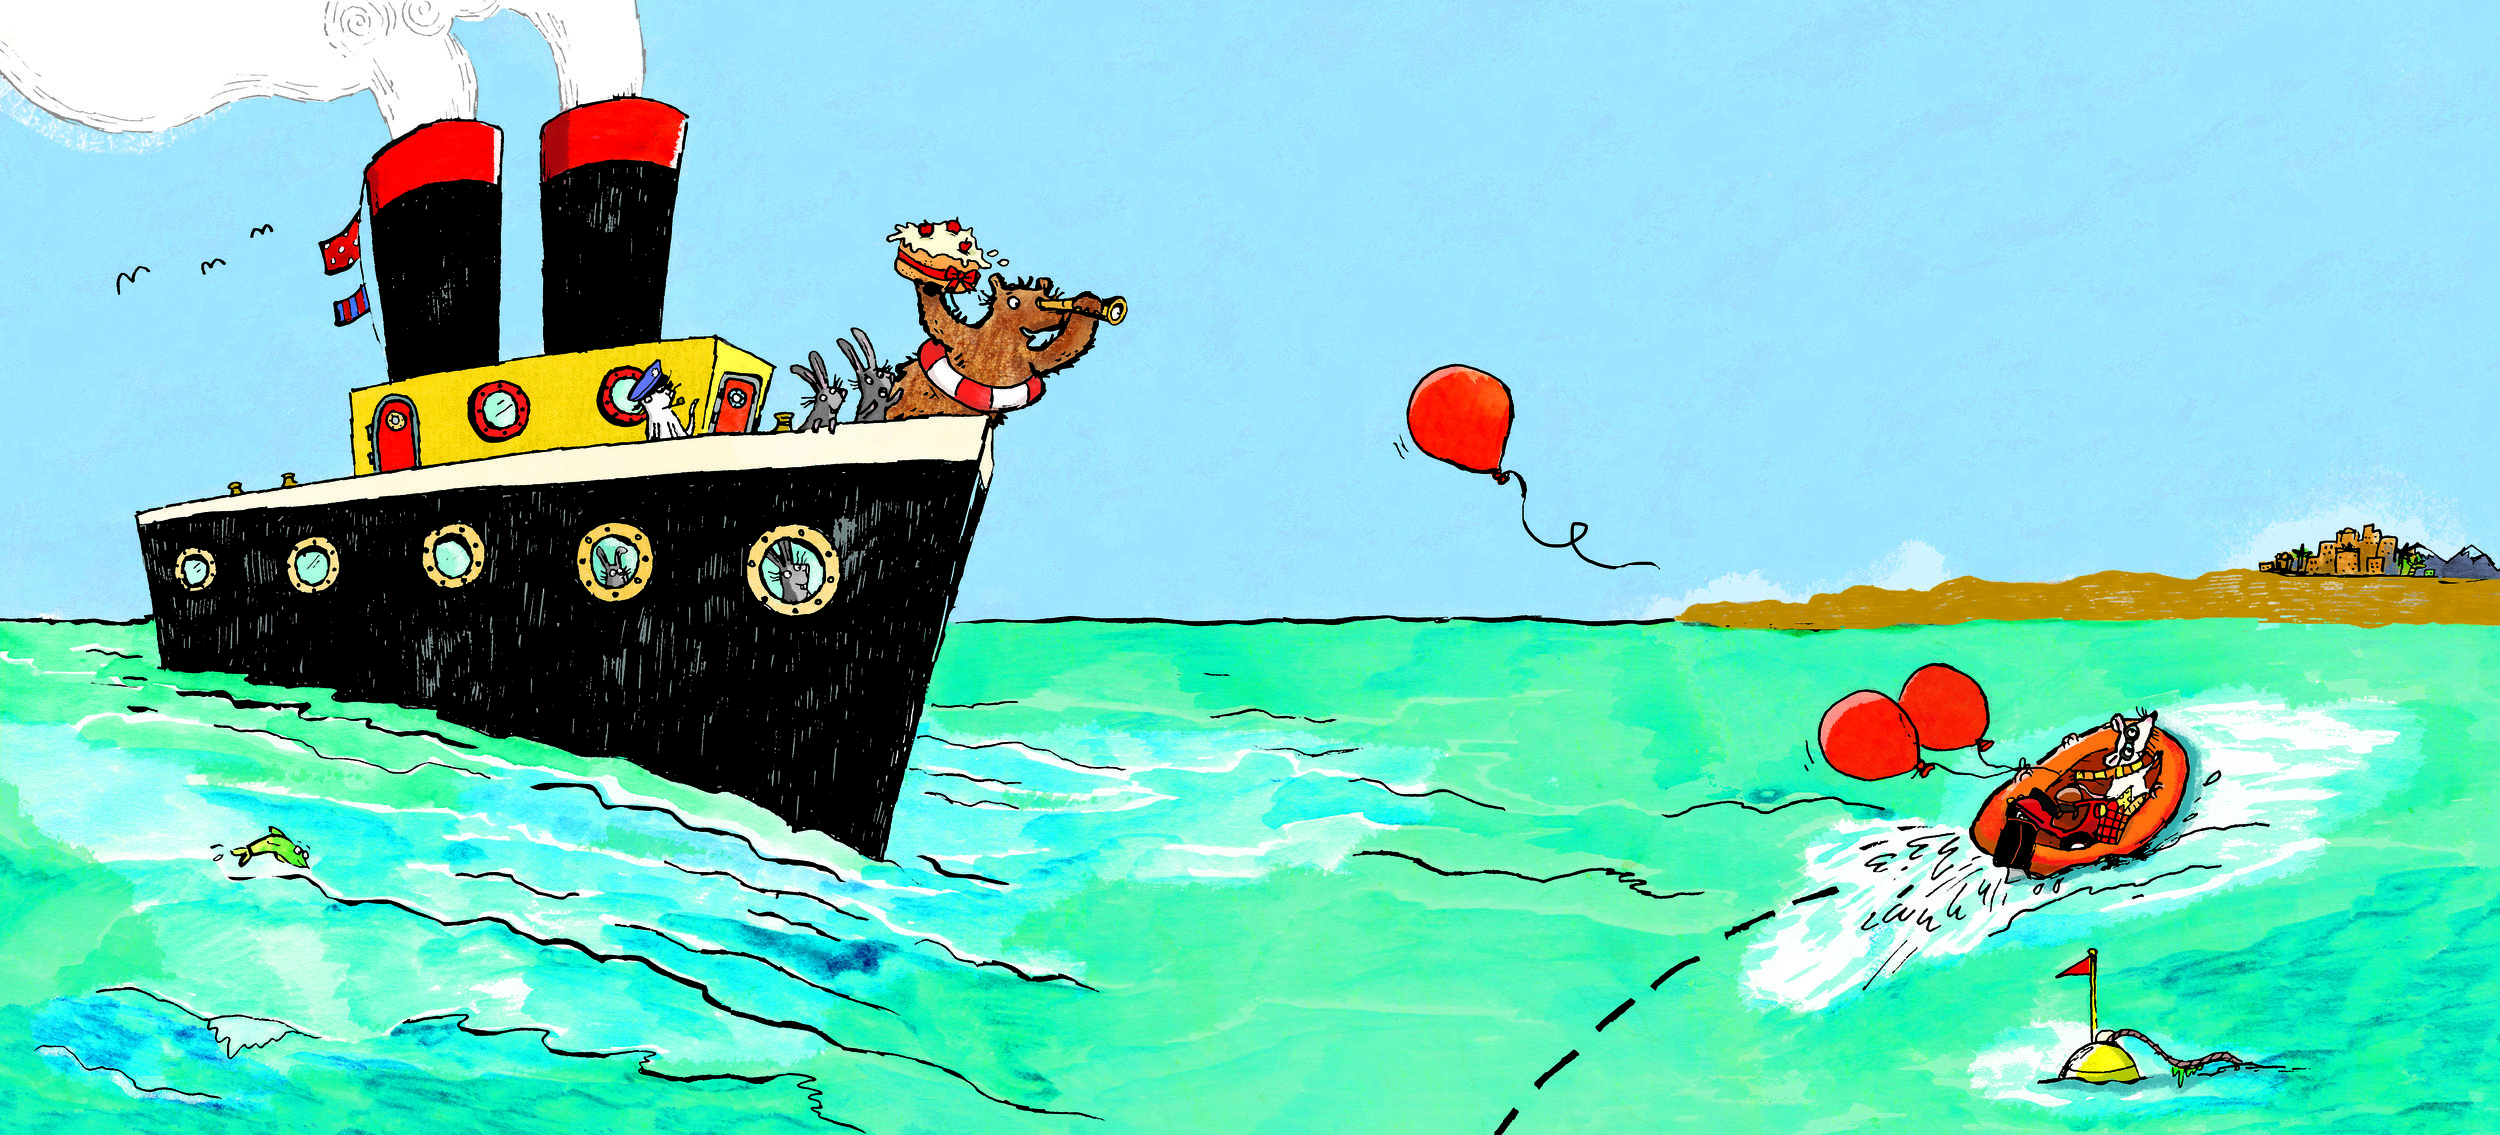 BEAR on a boat.jpg